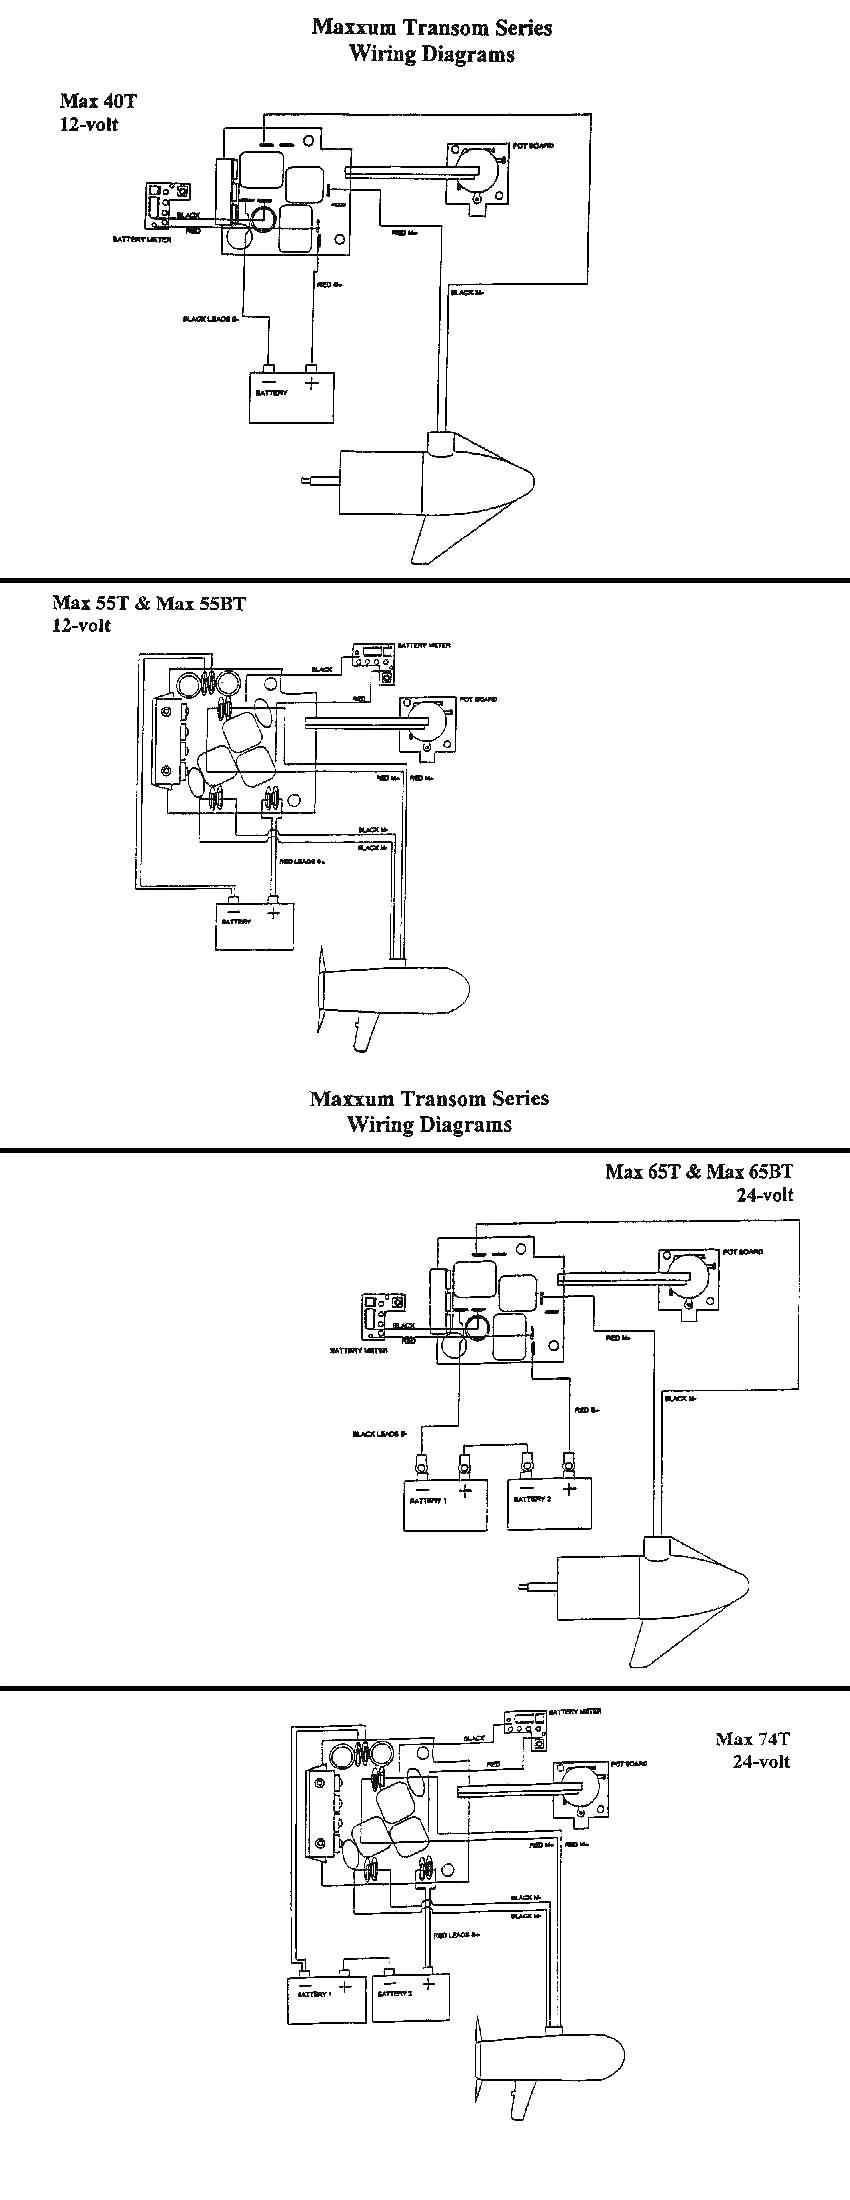 hight resolution of minn kota wiring schematic wiring diagram centreminn kota deckhand wiring diagram wiring diagramminn kota wiring schematic